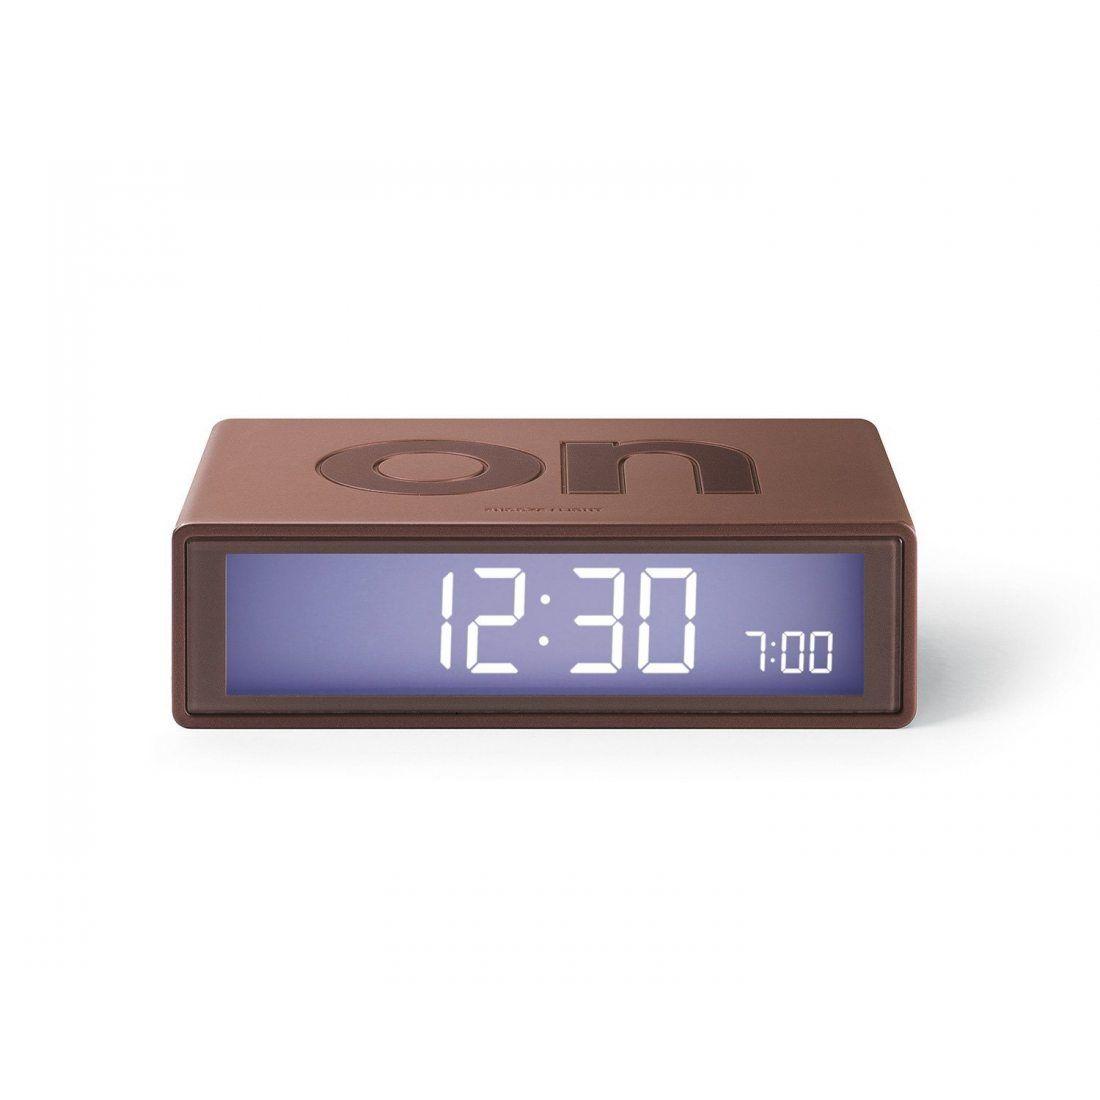 Lexon LR130.MM Flip Horloge  Réveil LCD ABS Gomme Marron 10,5 x 2,9 x 6,5 cm